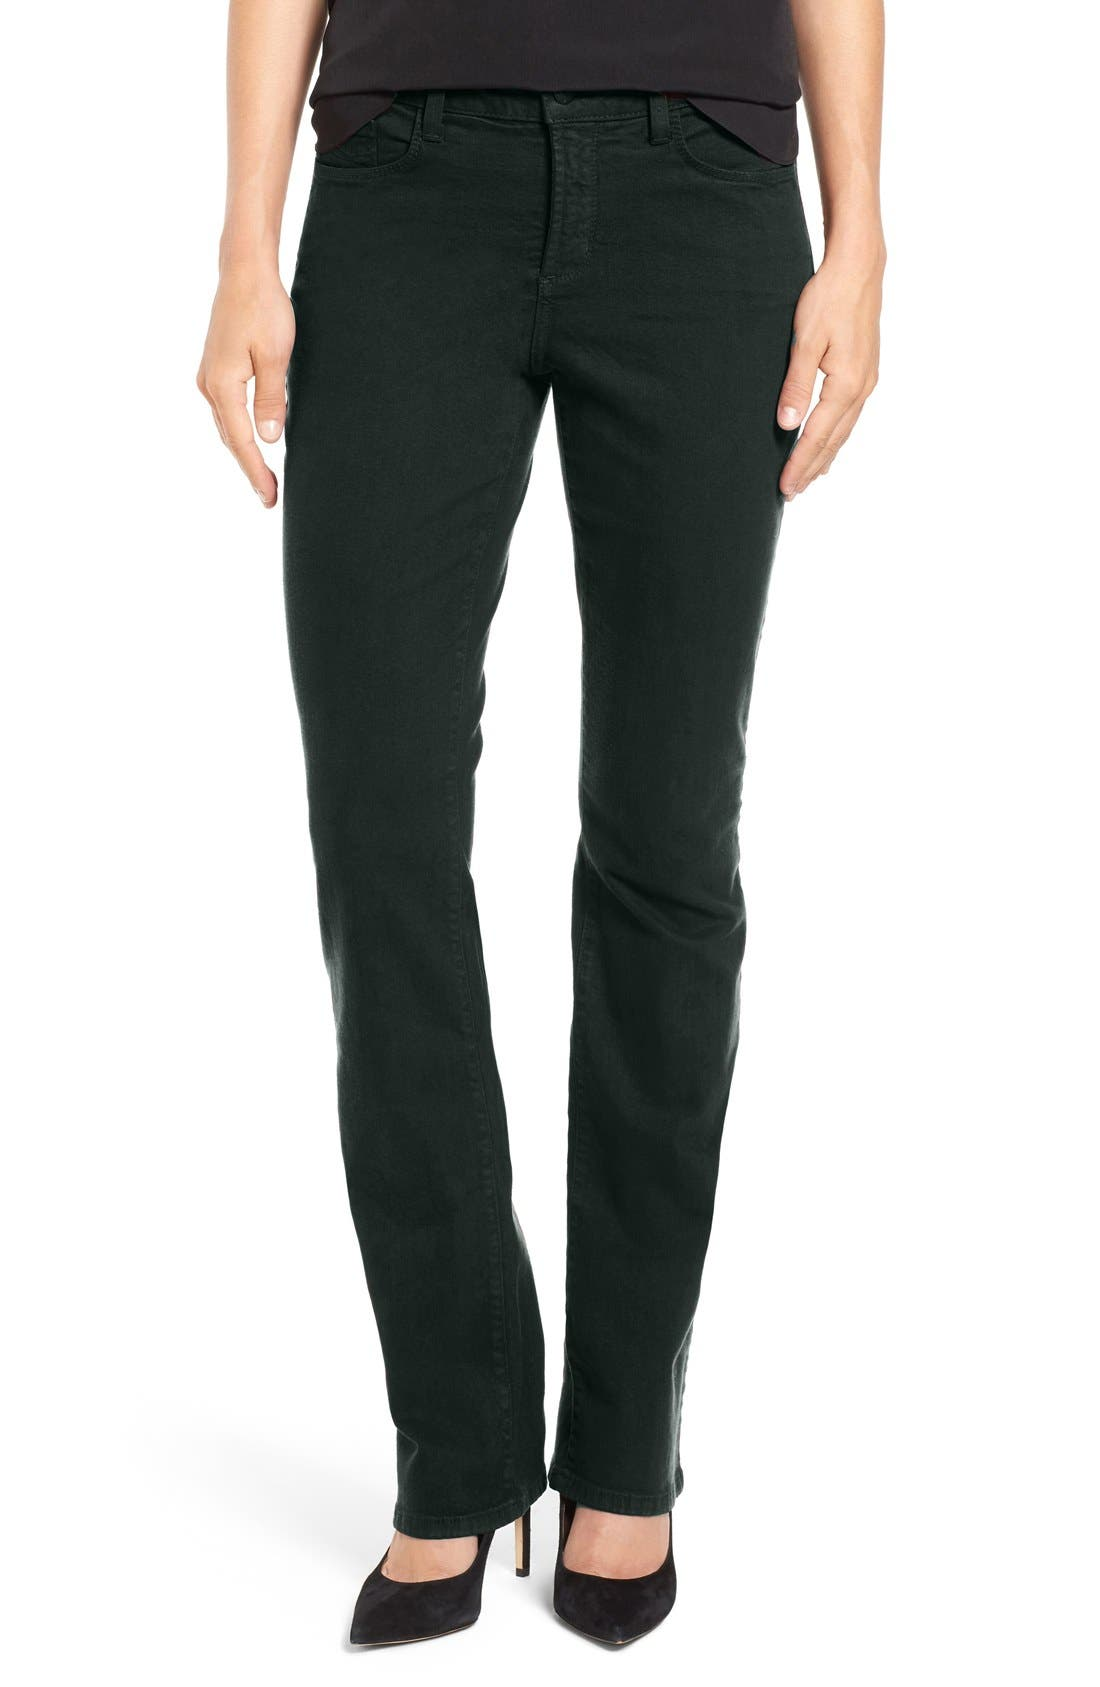 Main Image - NYDJ Sheri Stretch Skinny Jeans (Regular & Petite)